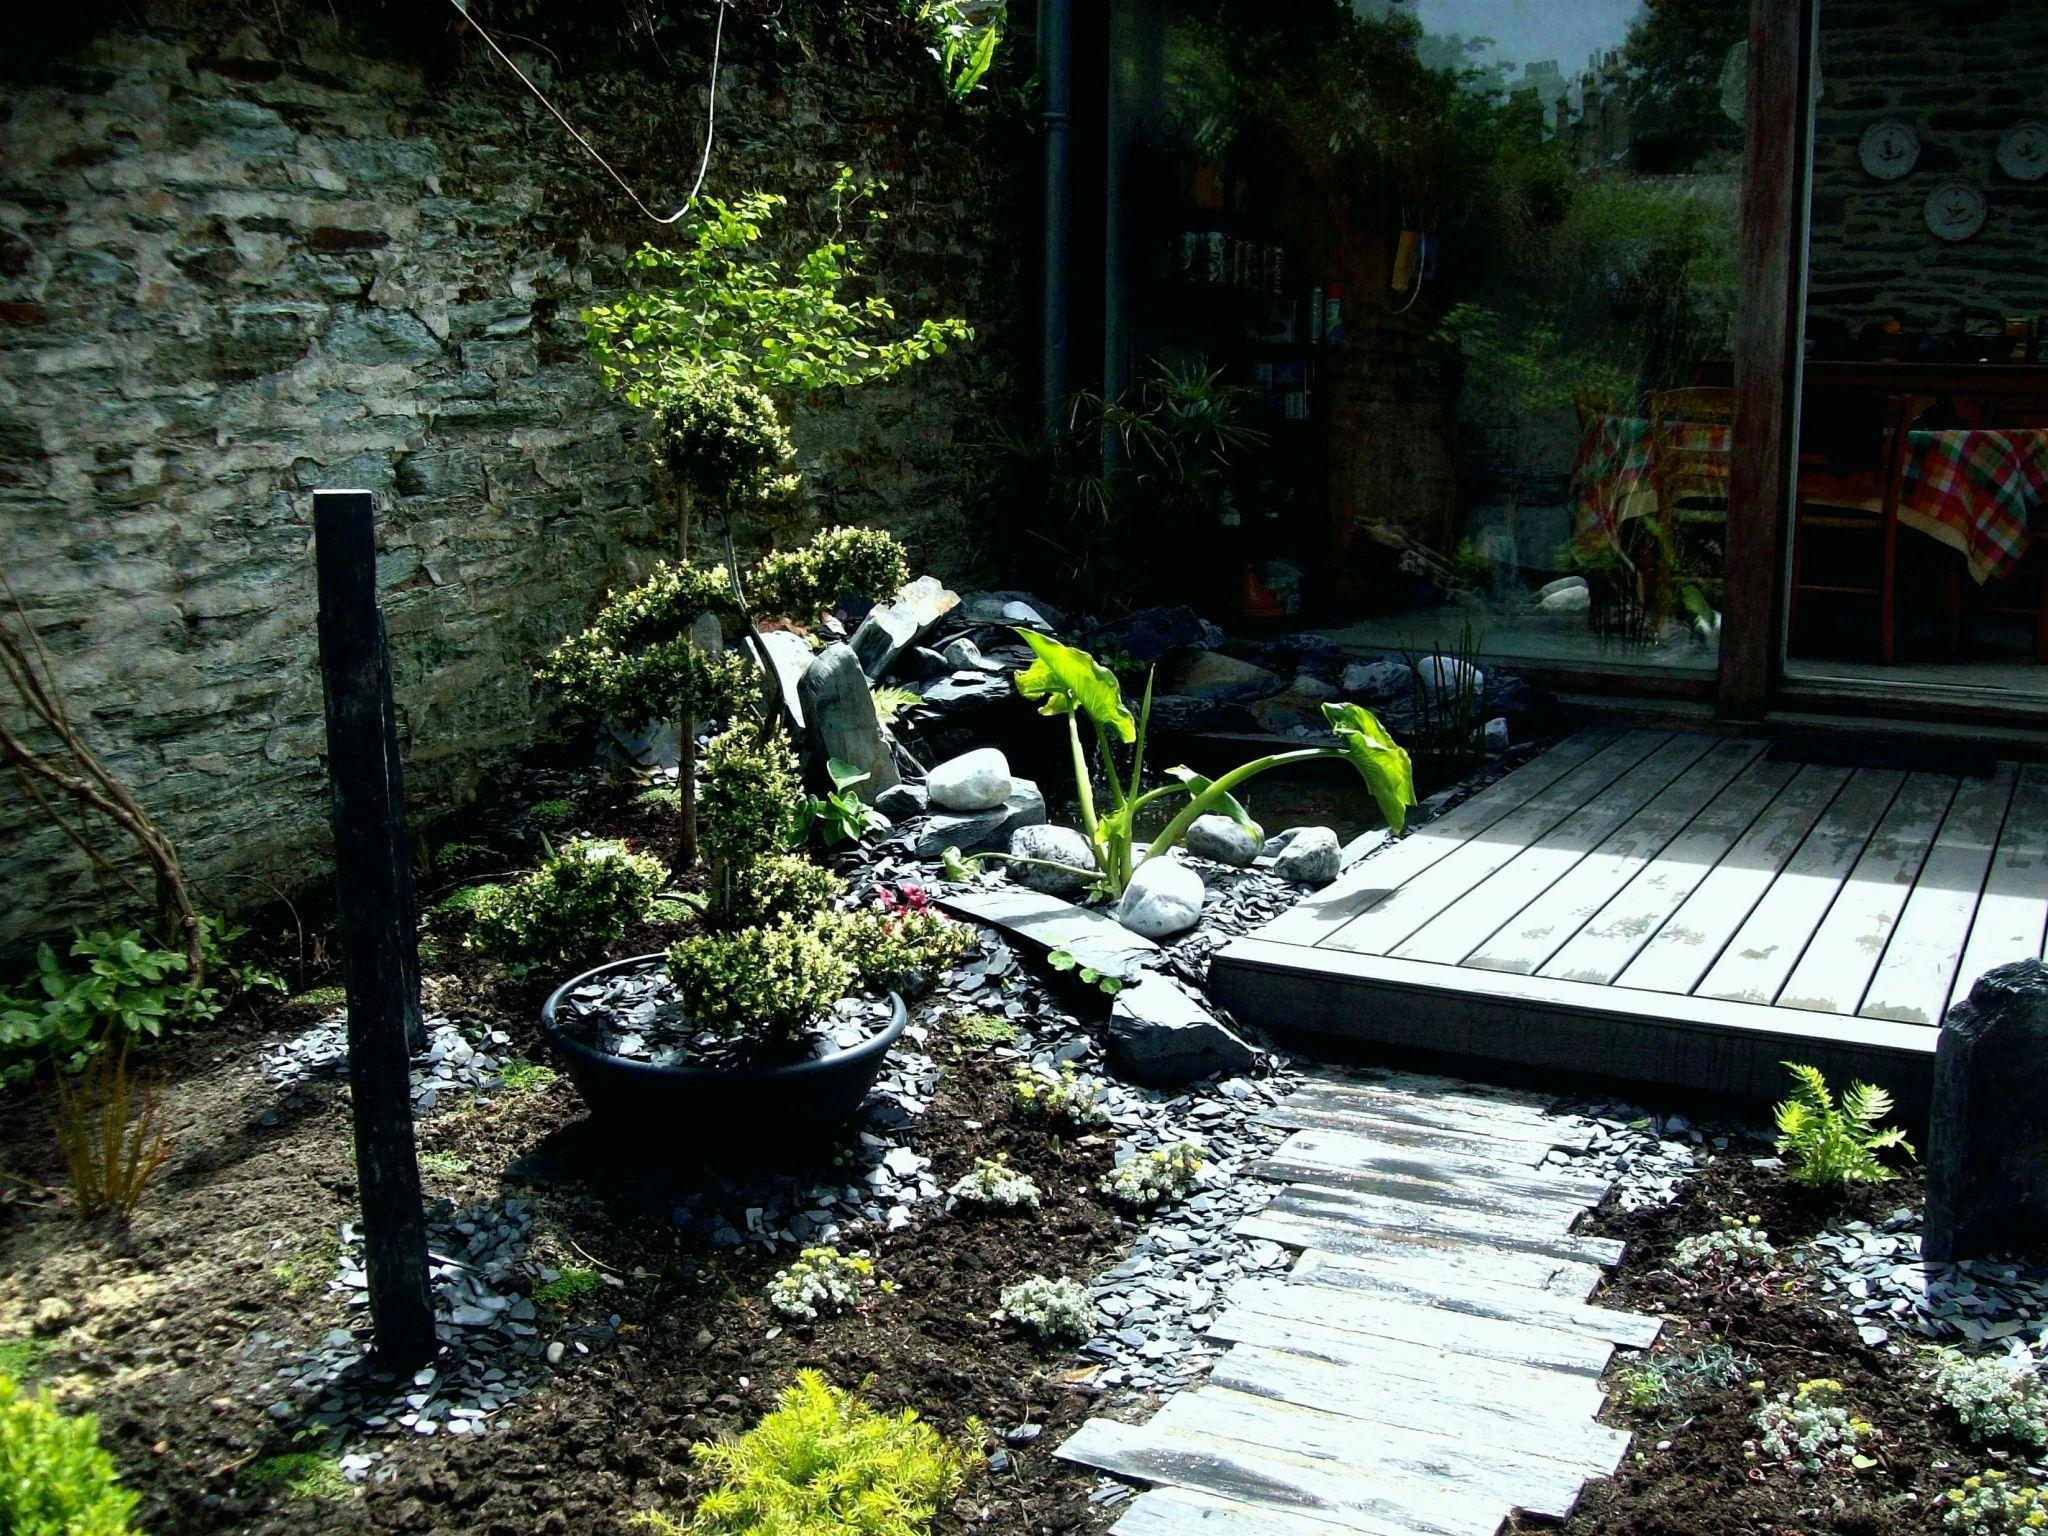 40 Best Of Amenagement Jardin Exterieur | Salon Jardin dedans Amenagement Petit Jardin Mediterraneen